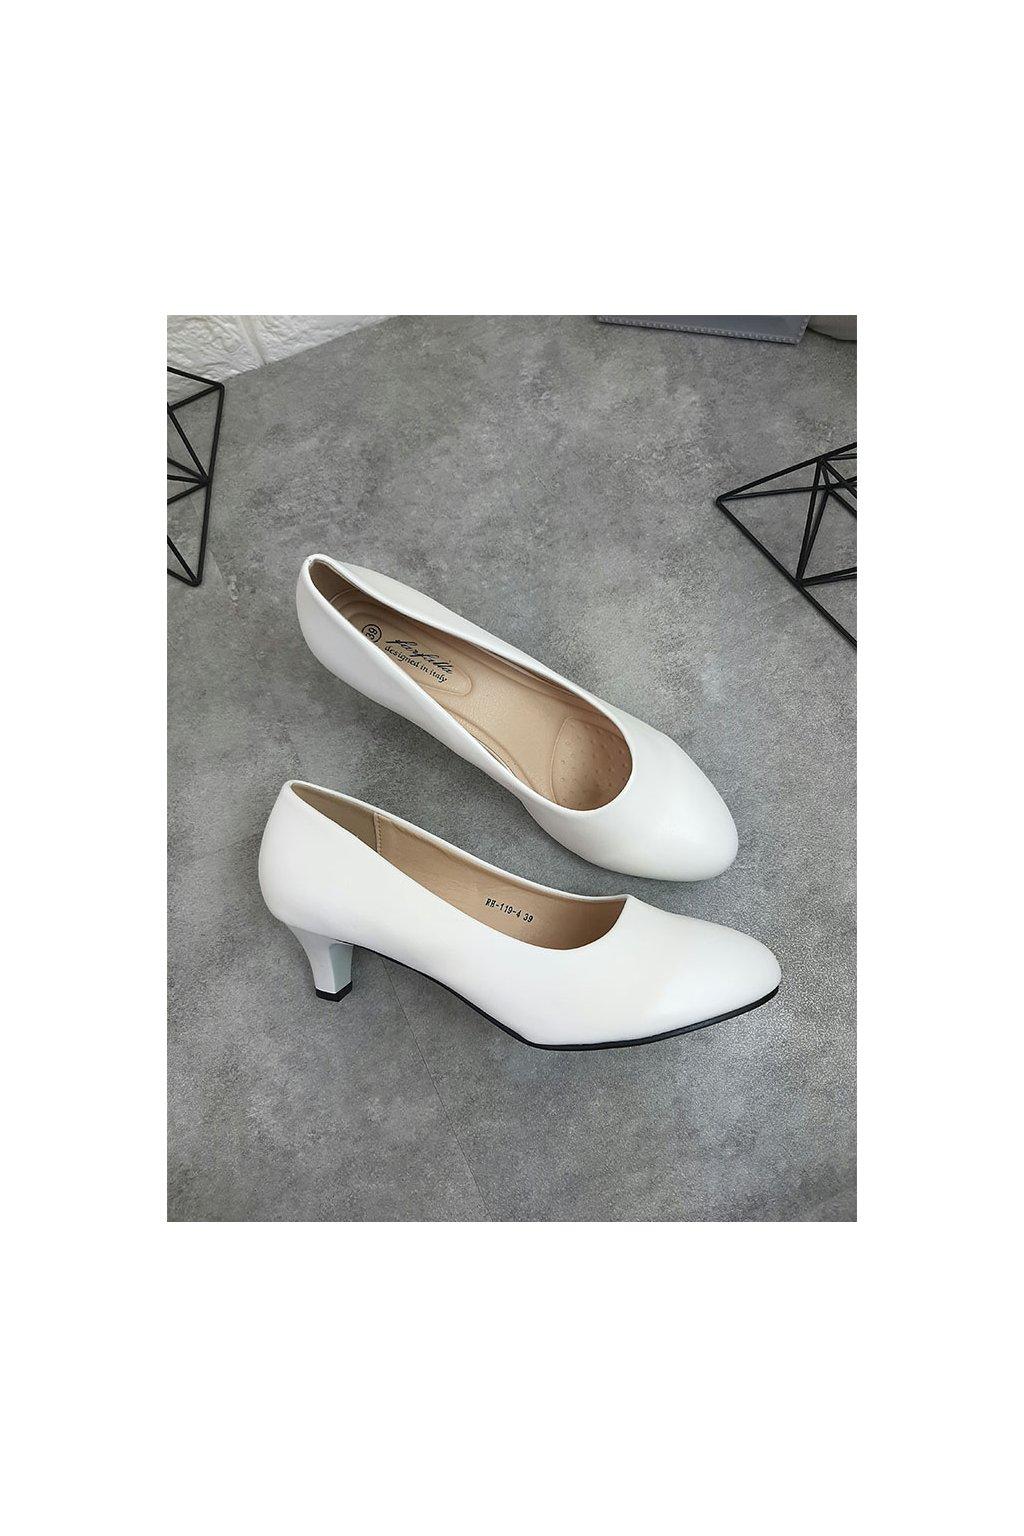 RH 119 4 WHITE Bílé lodičky (1)